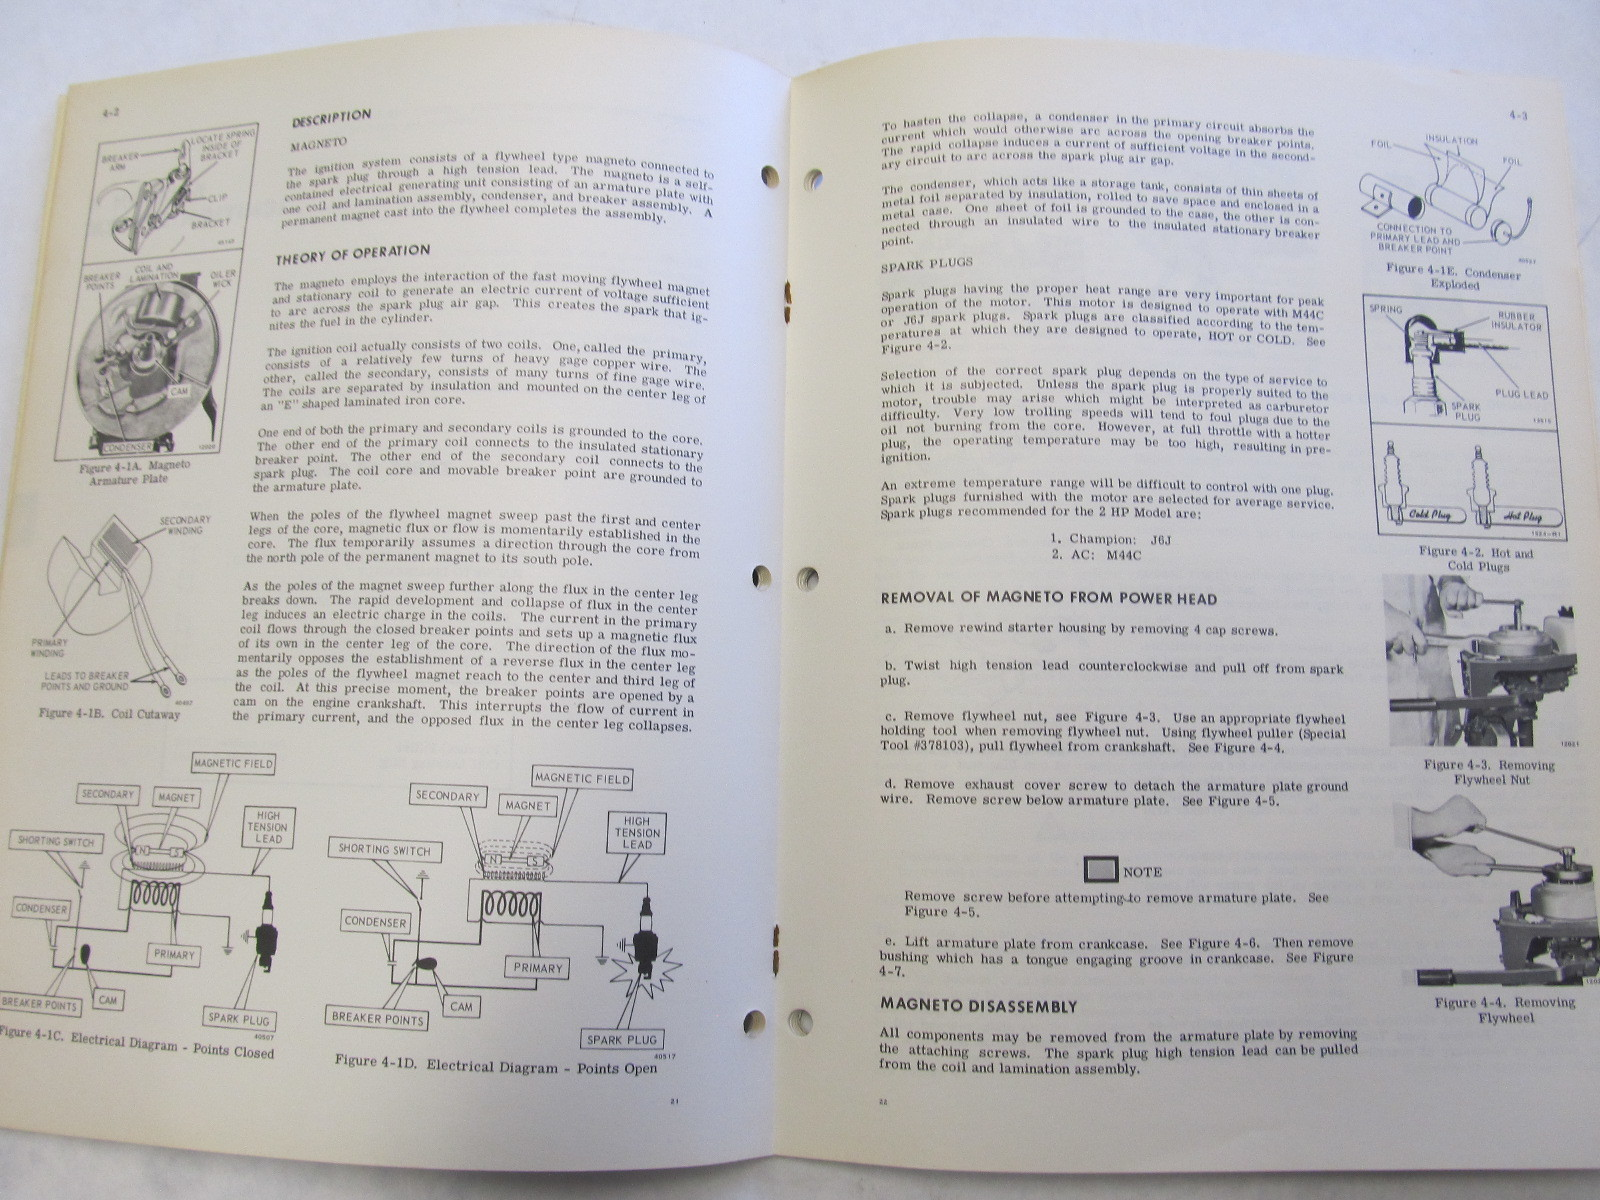 1972 Evinrude Outboard Service Manual 2 Hp Mate 2202